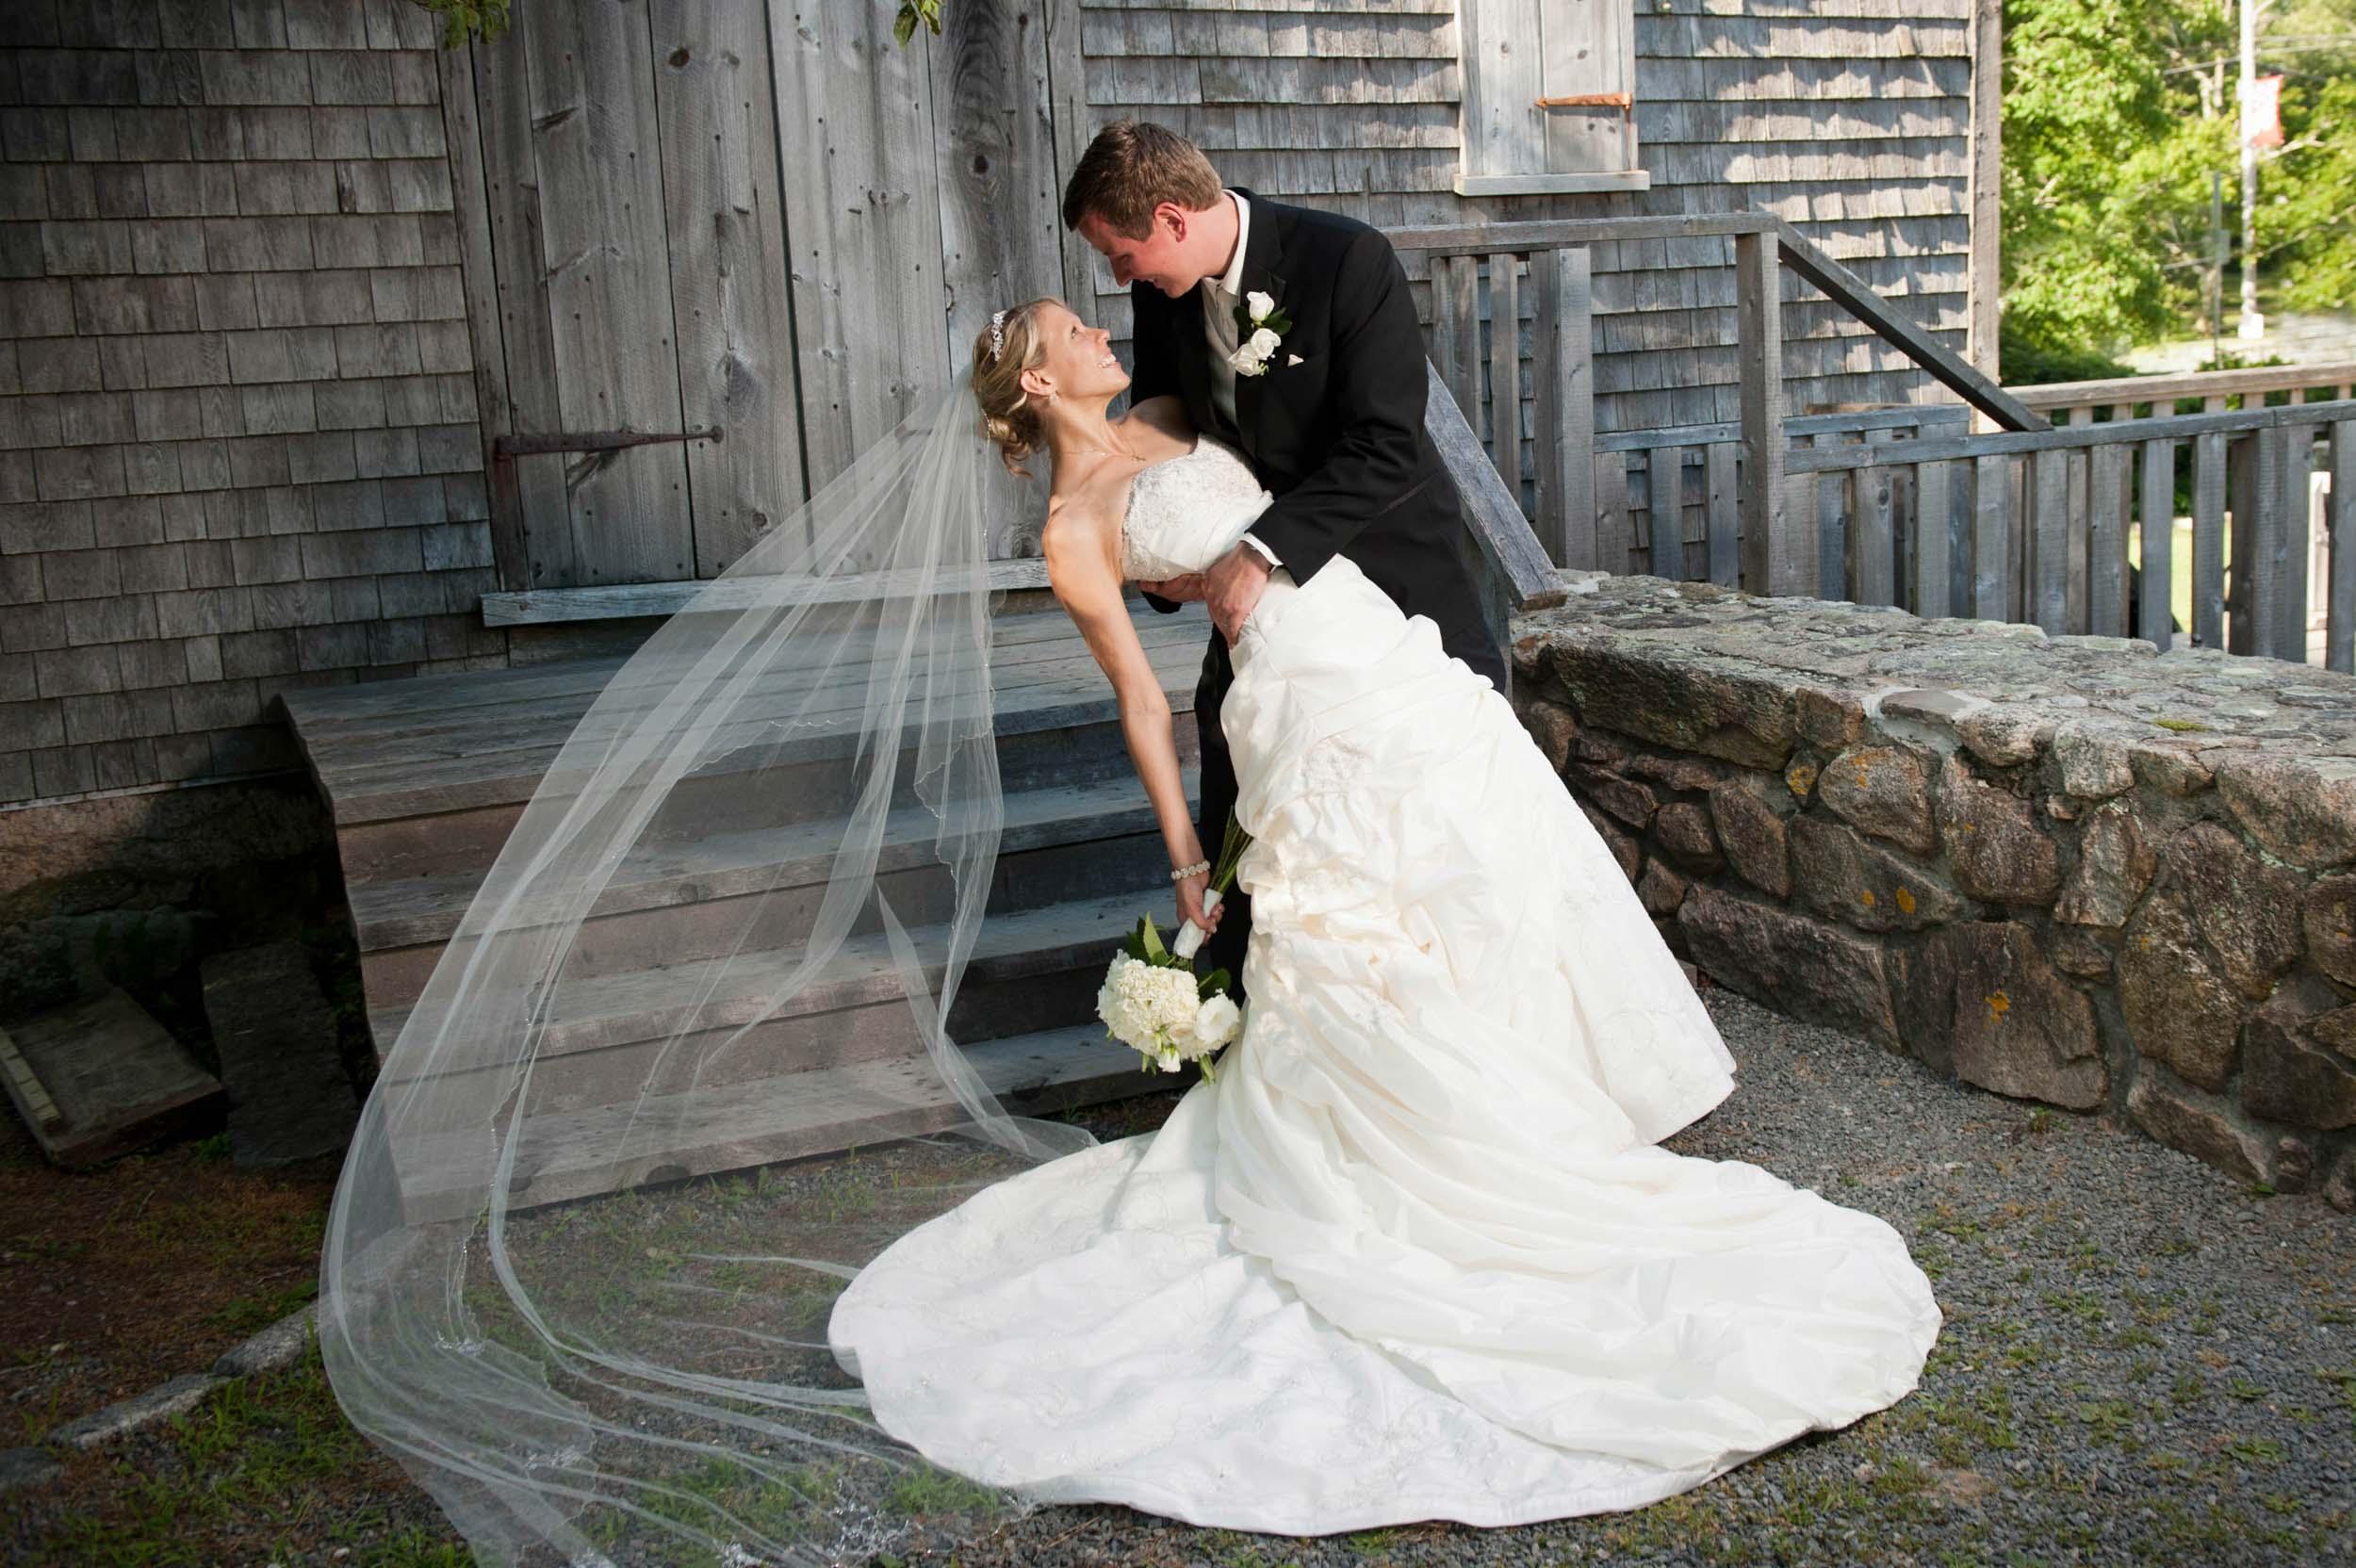 Wedding82G&C-358-2.jpg